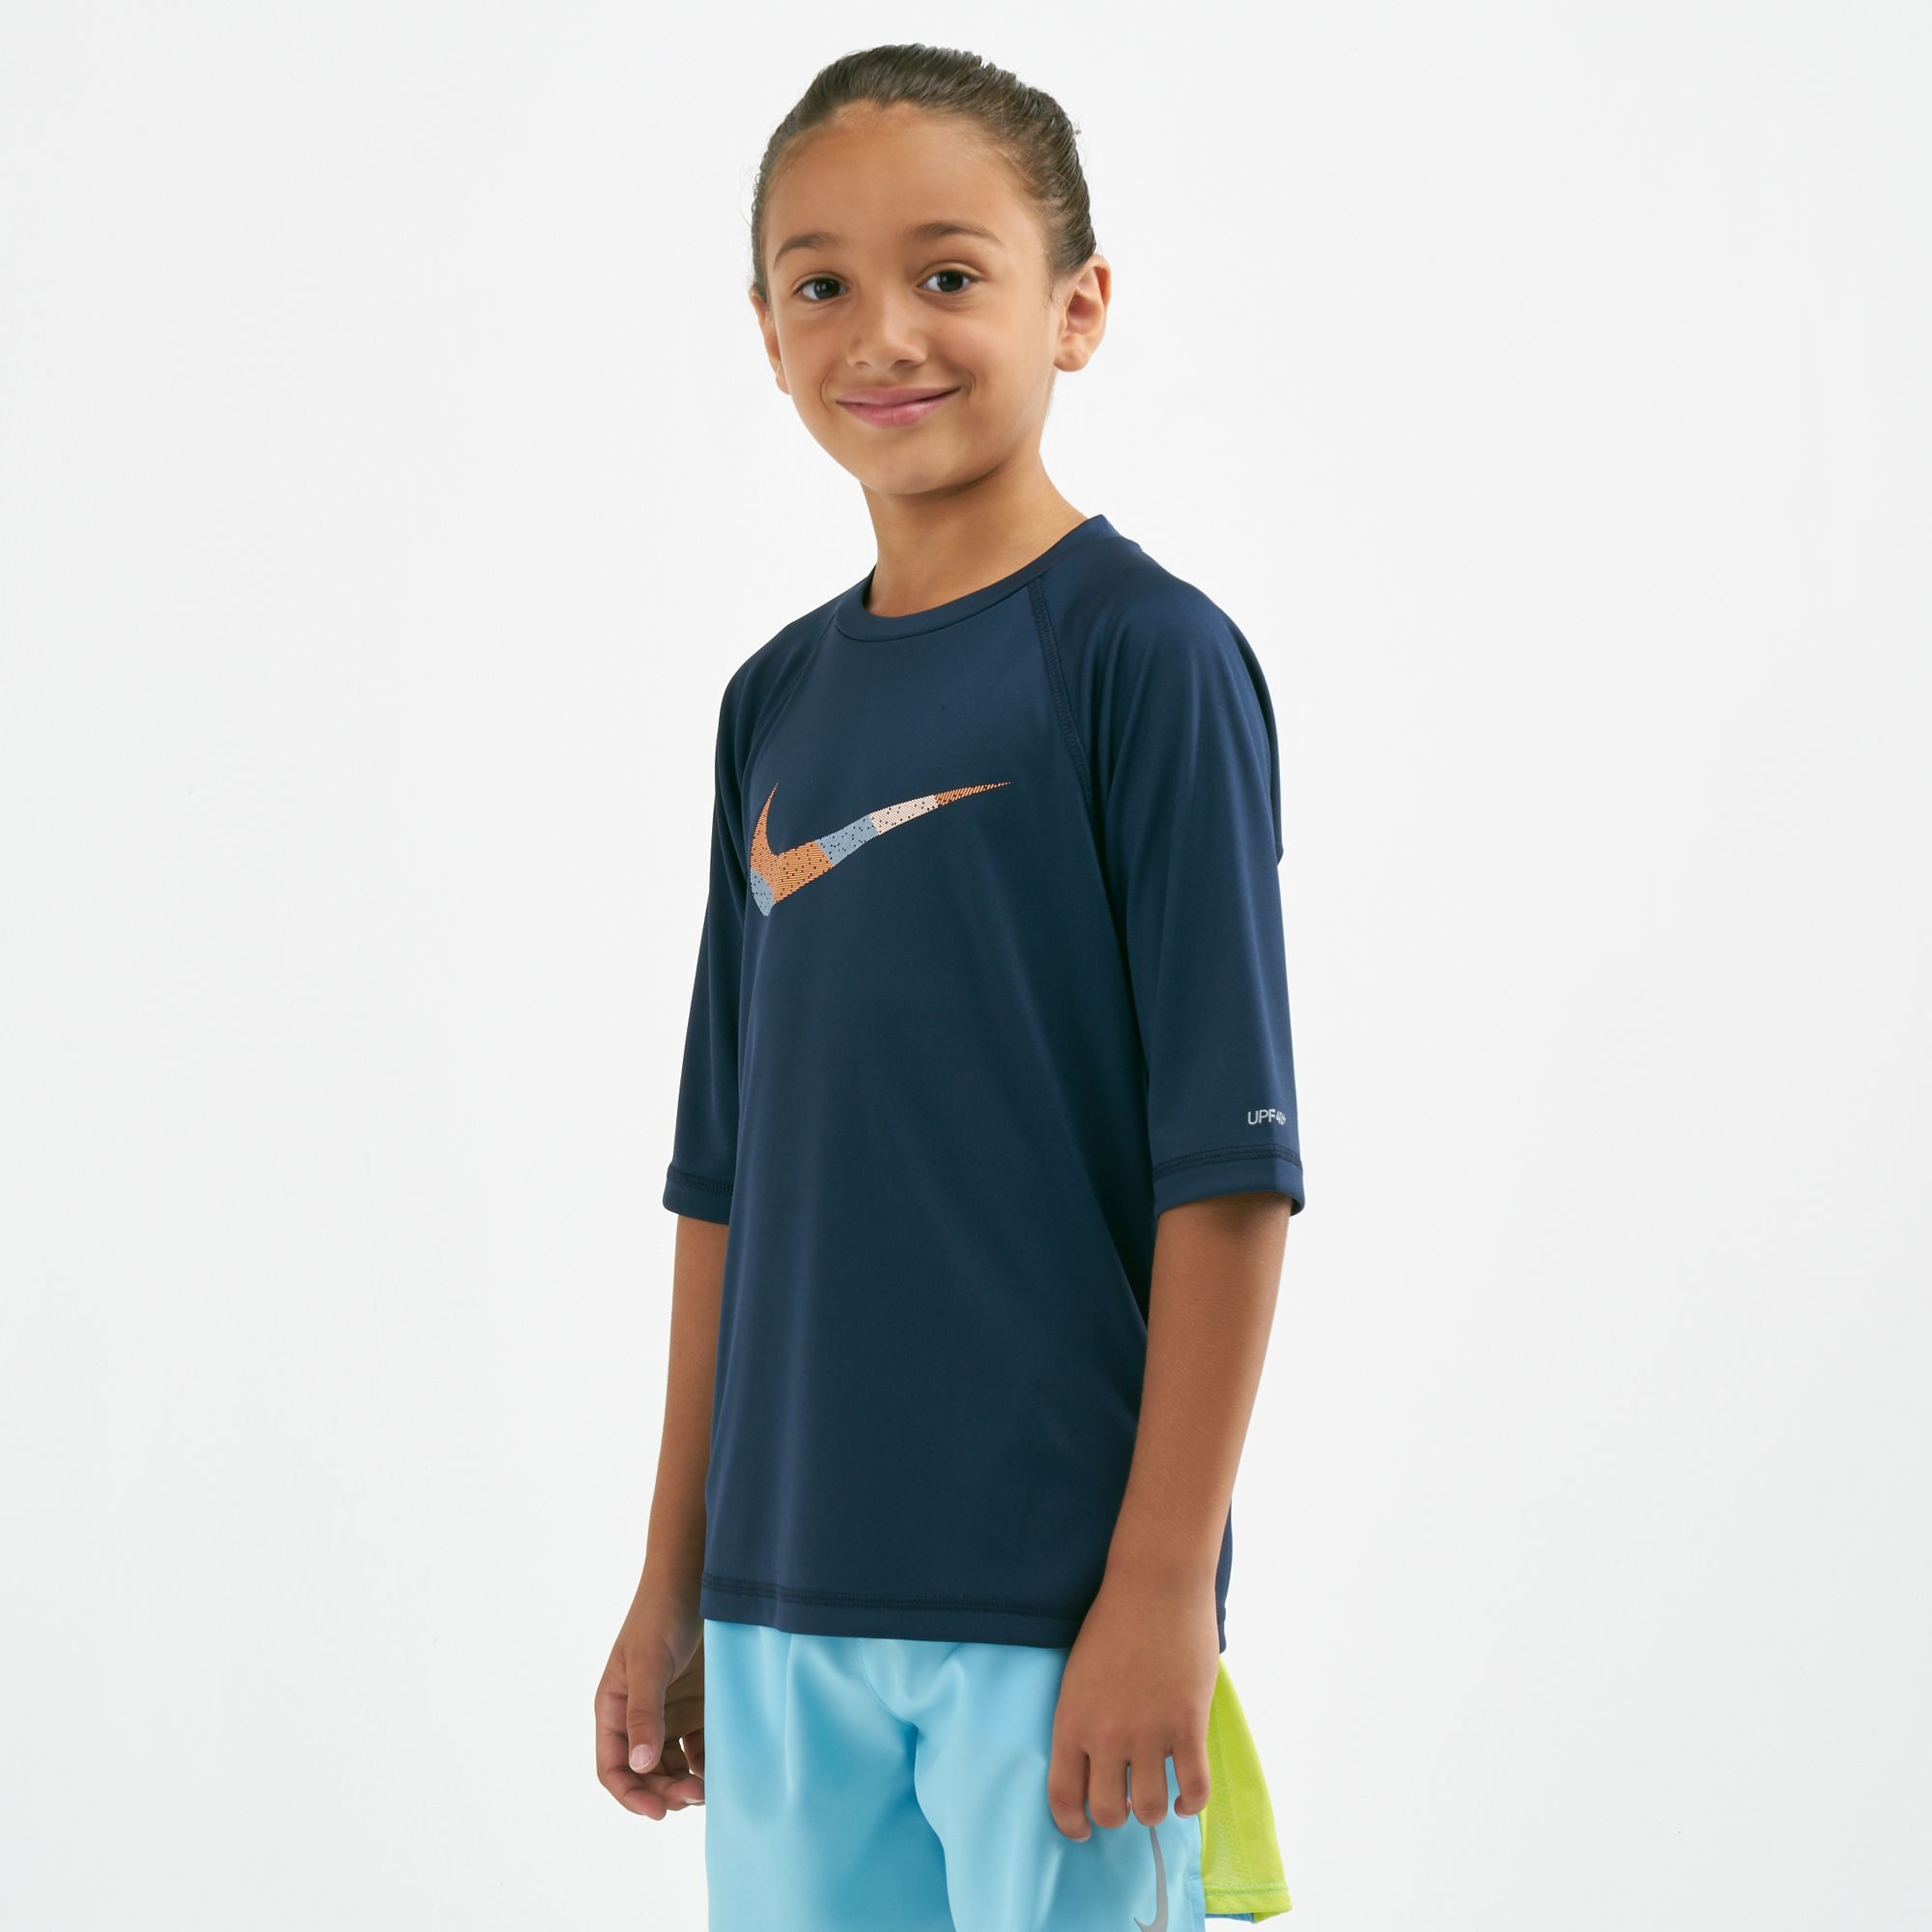 74a80aea Nike Swim Kids' Mash Up Hydroguard Rash T-Shirt (Younger Kids) | Swimwear |  Clothing | Kids | SSS